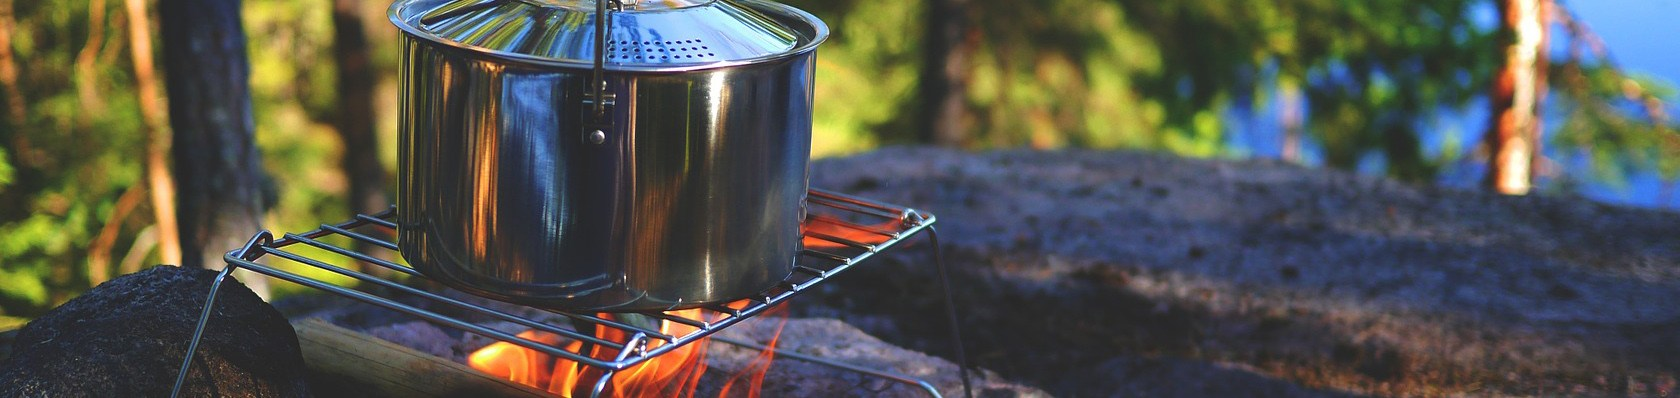 Campingkocher  im Test auf ExpertenTesten.de